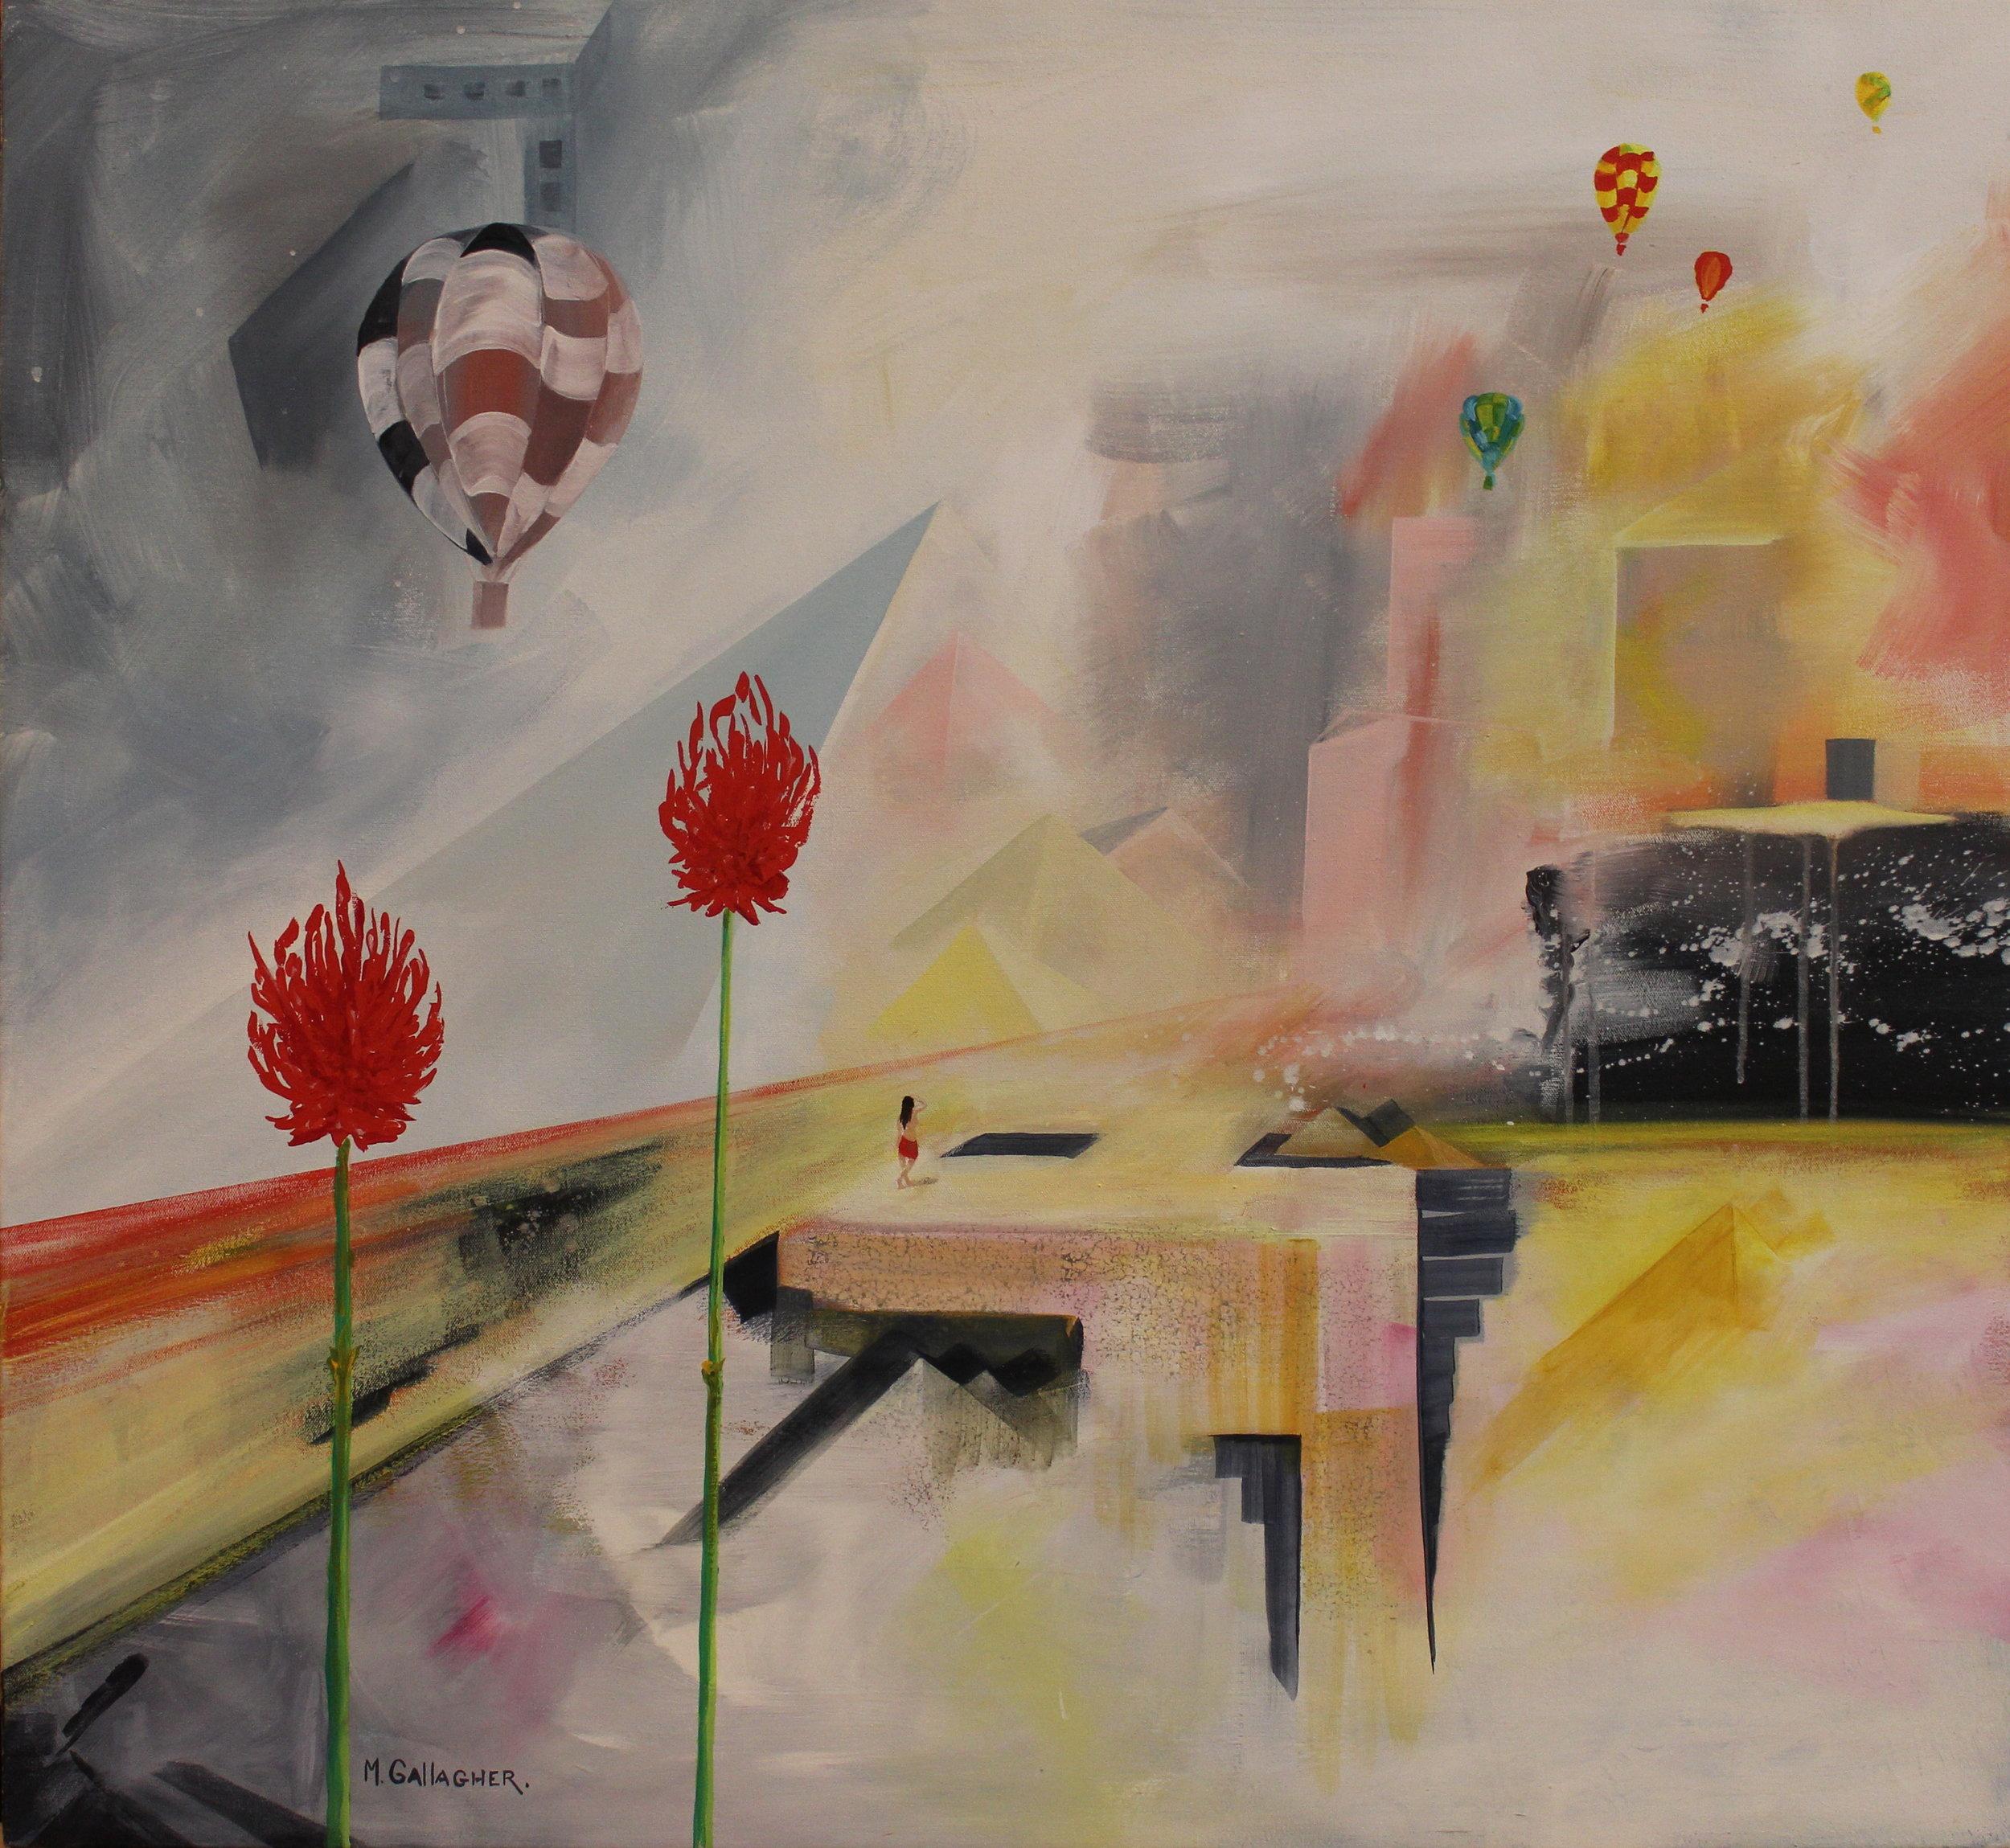 13. GALLAGHER_Martin_Slow Ride to Cairo_Acrylic on Canvas_91cmx91cm.JPG